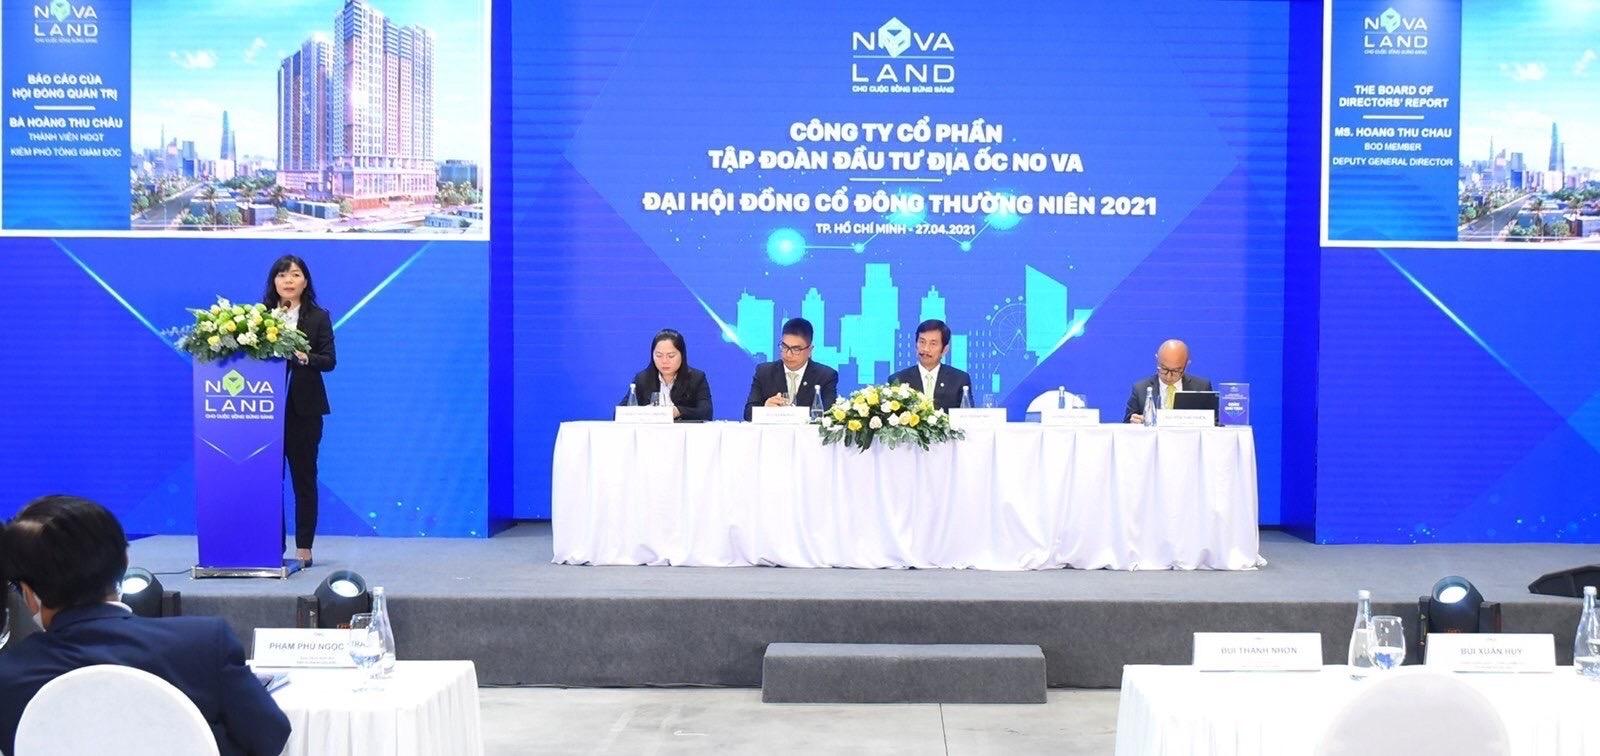 novaland unveils impressive business plan for 2021